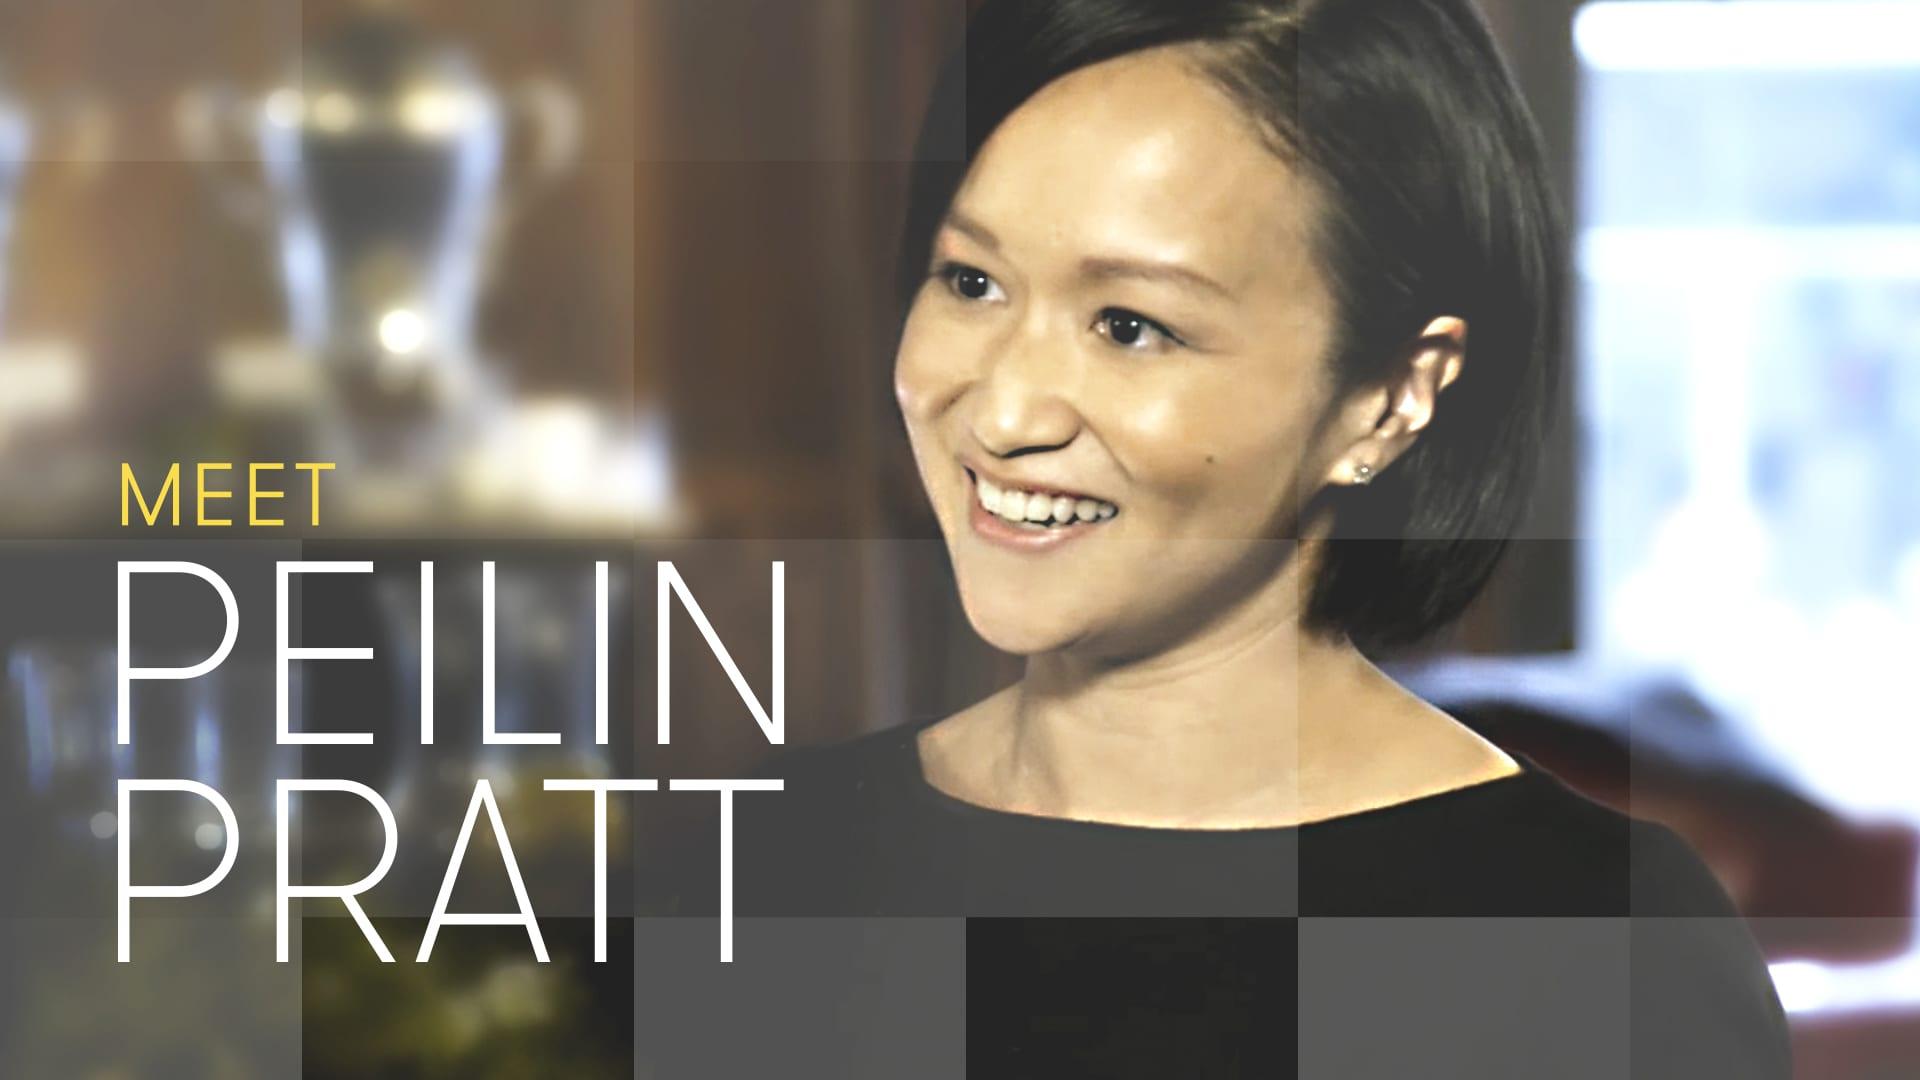 The Partner contestant Peilin Pratt